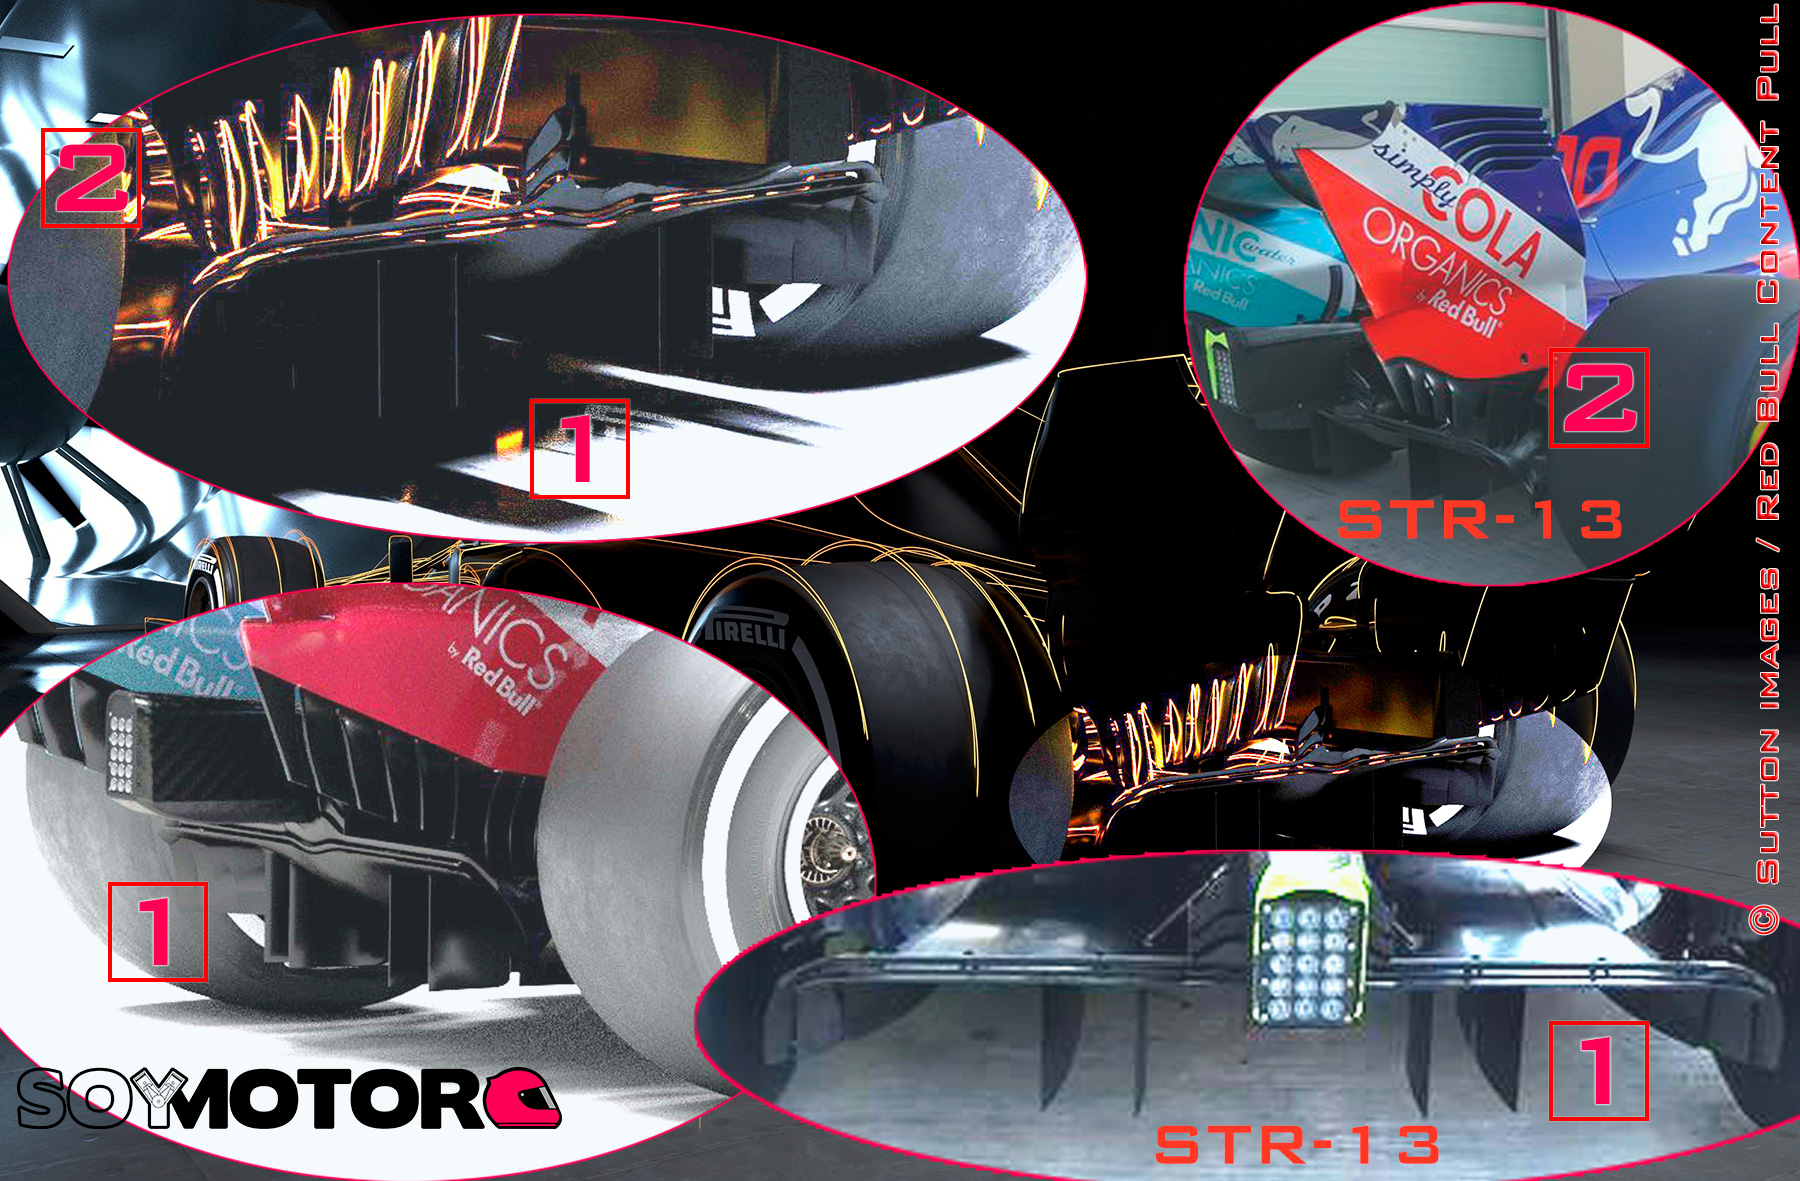 toro-rosso-str-14-trasera-2-soymotor.jpg